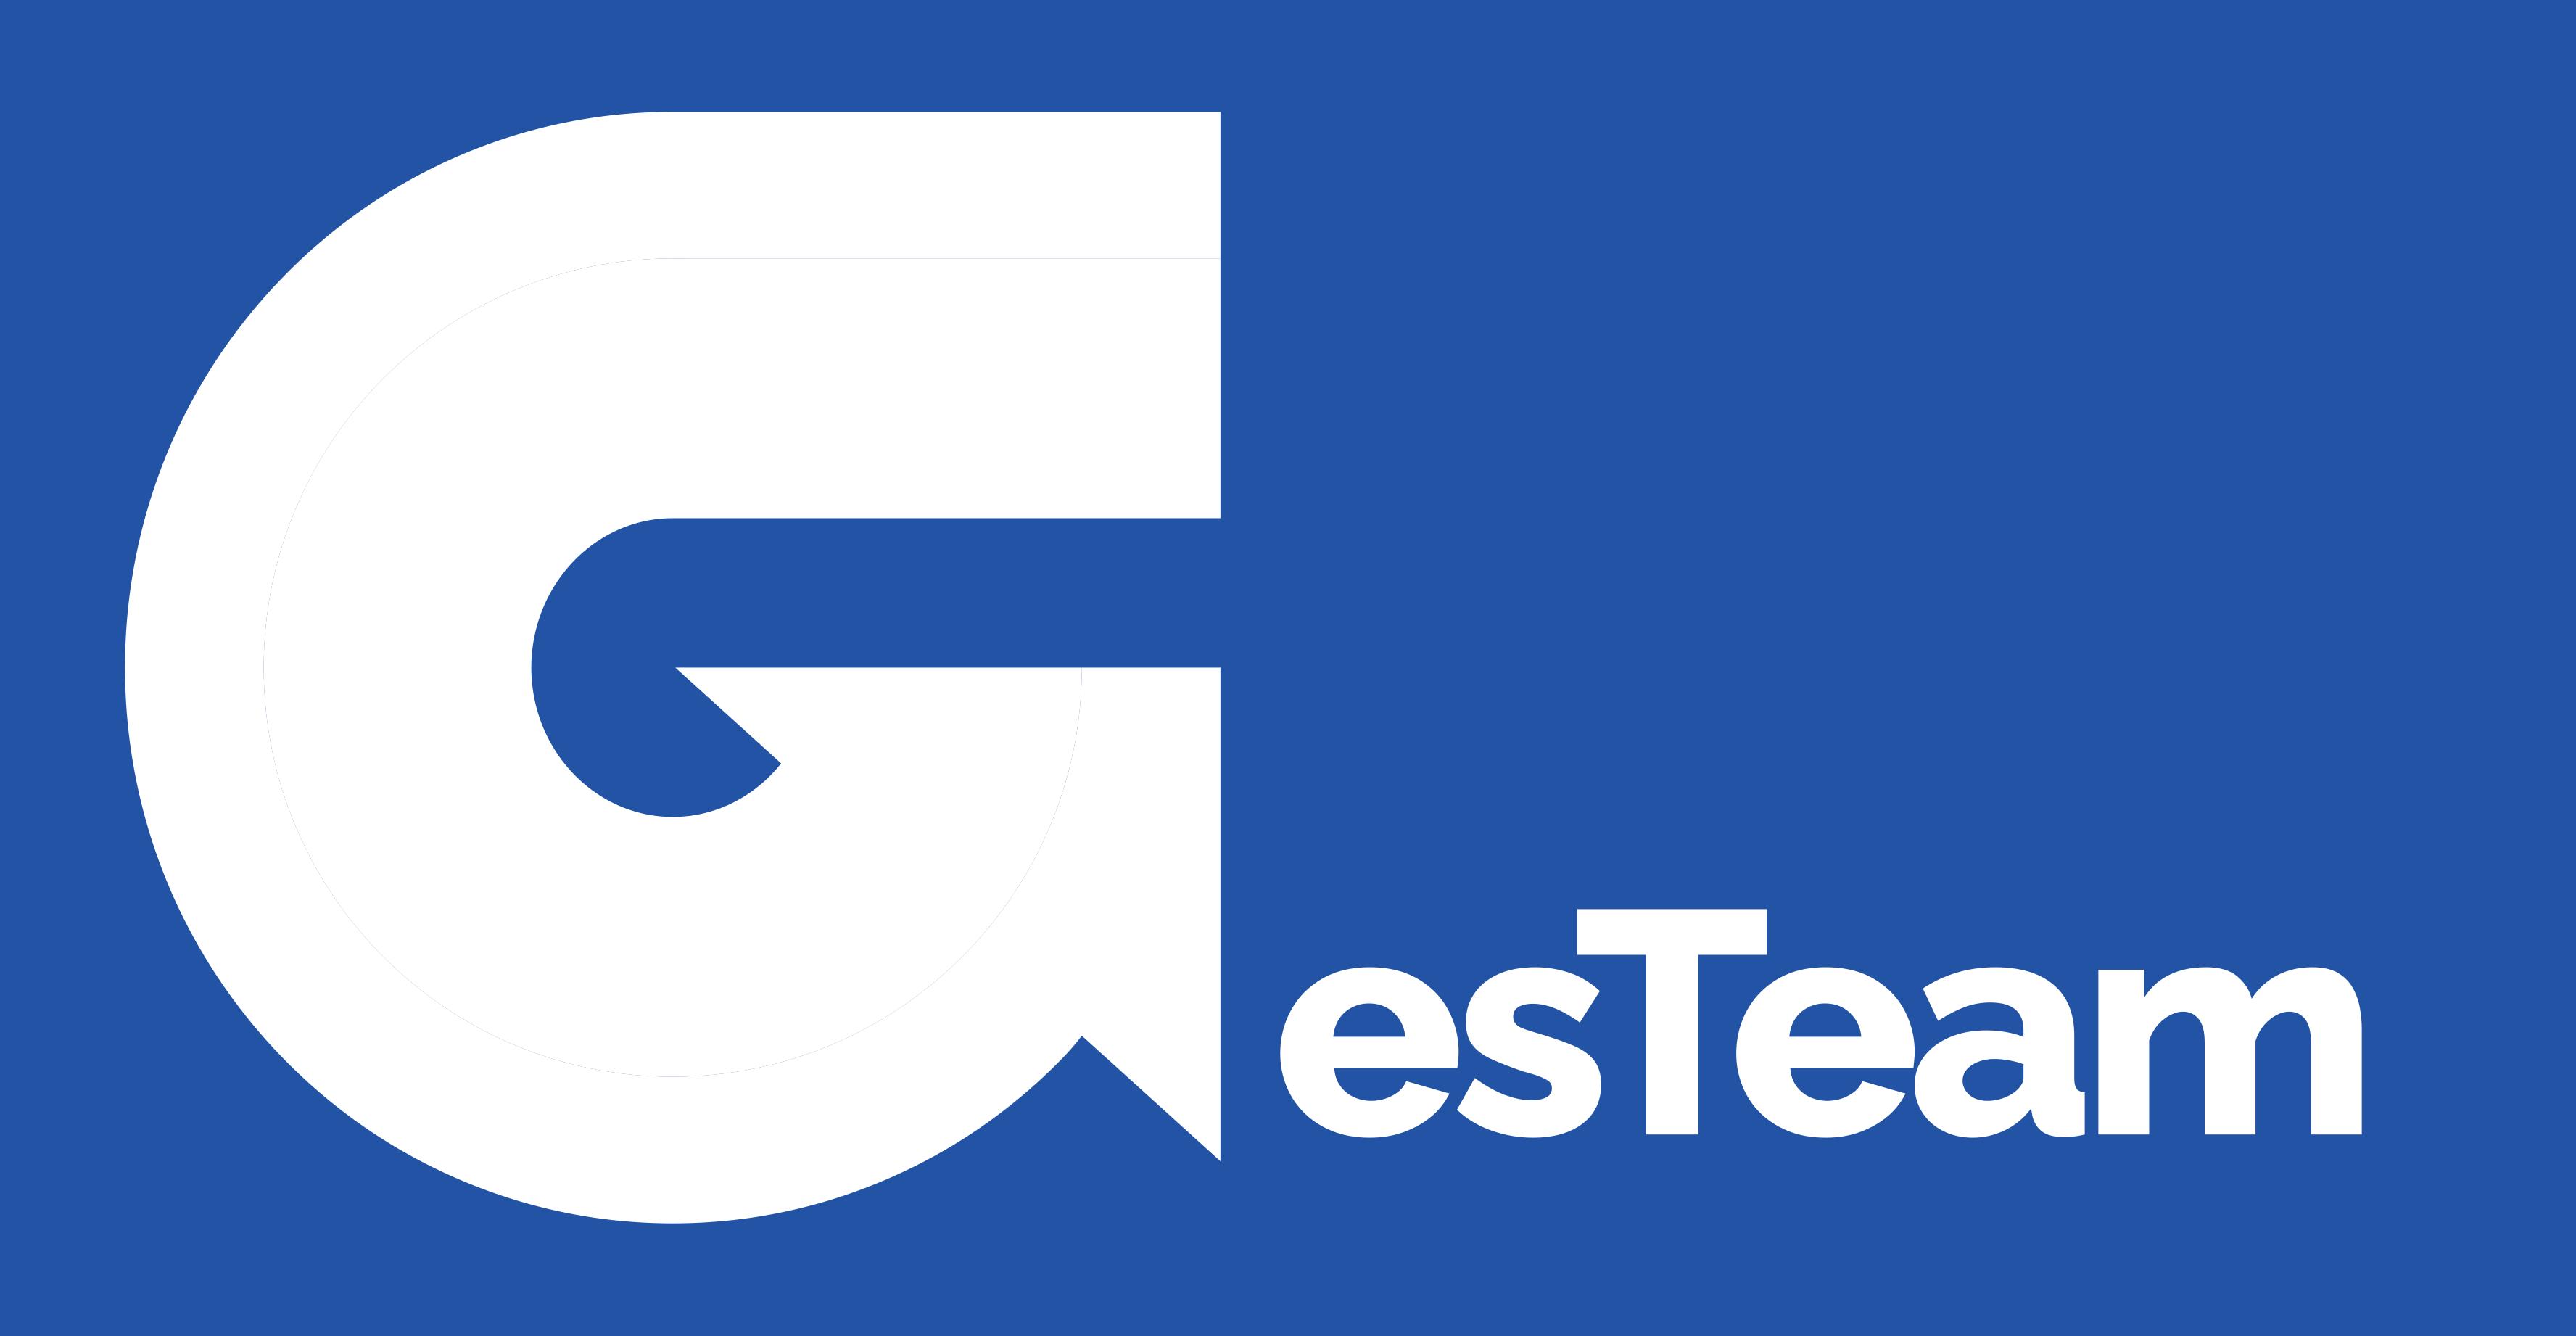 GesTeam